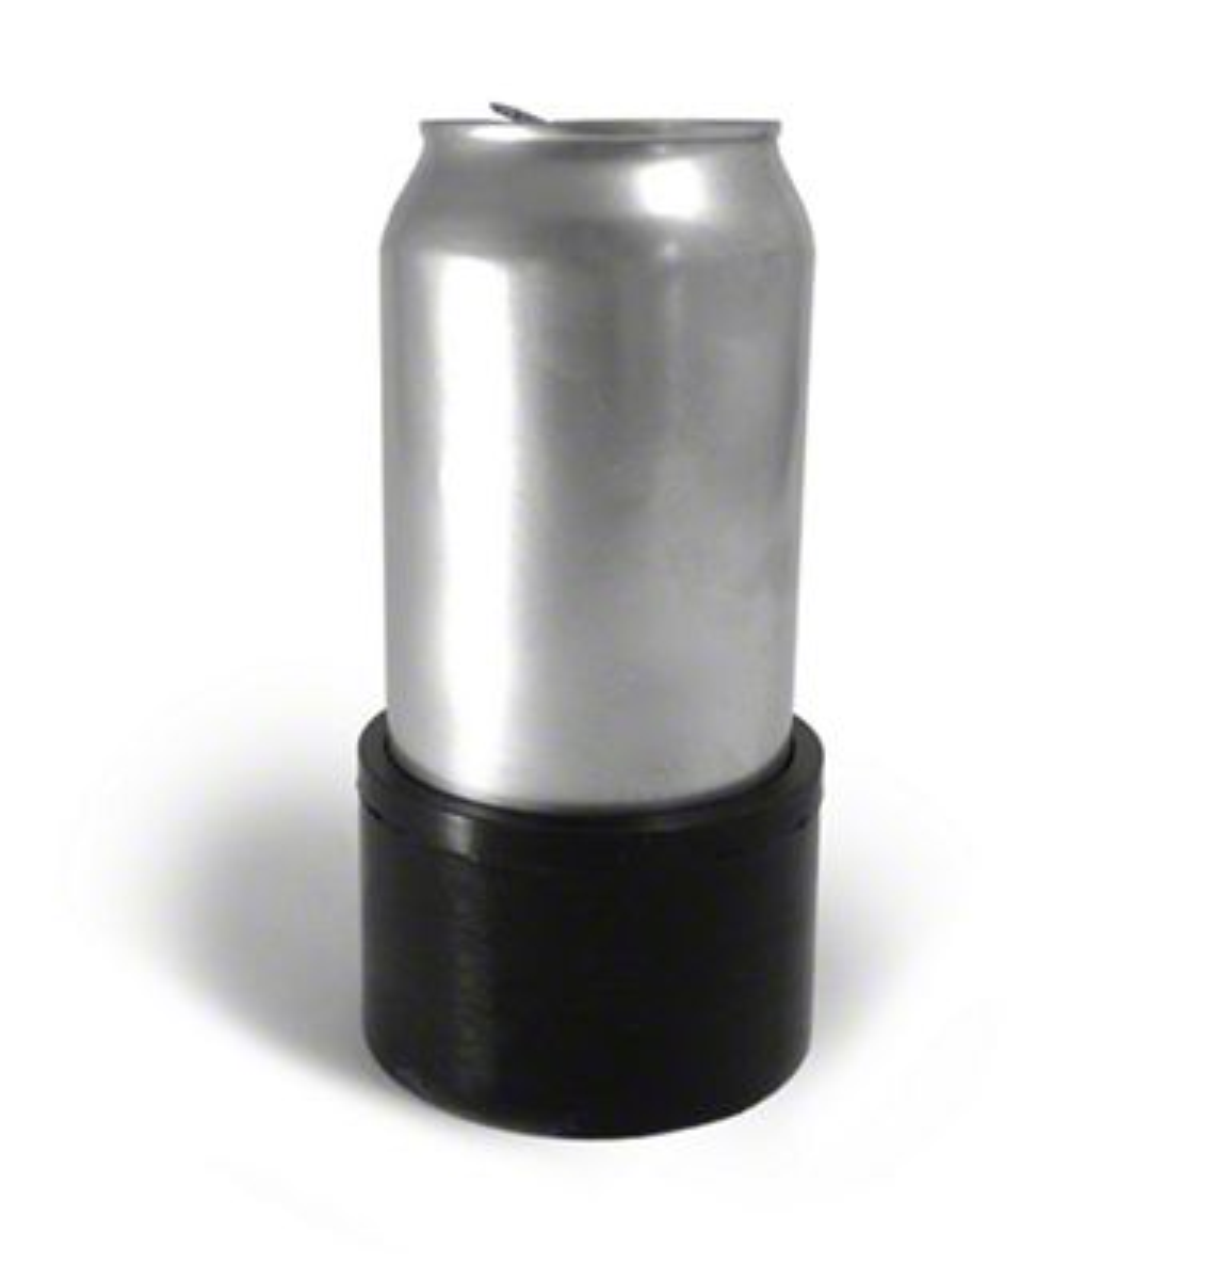 Steinjager Magnetic Can Holder (07-18 Jeep Wrangler JK)